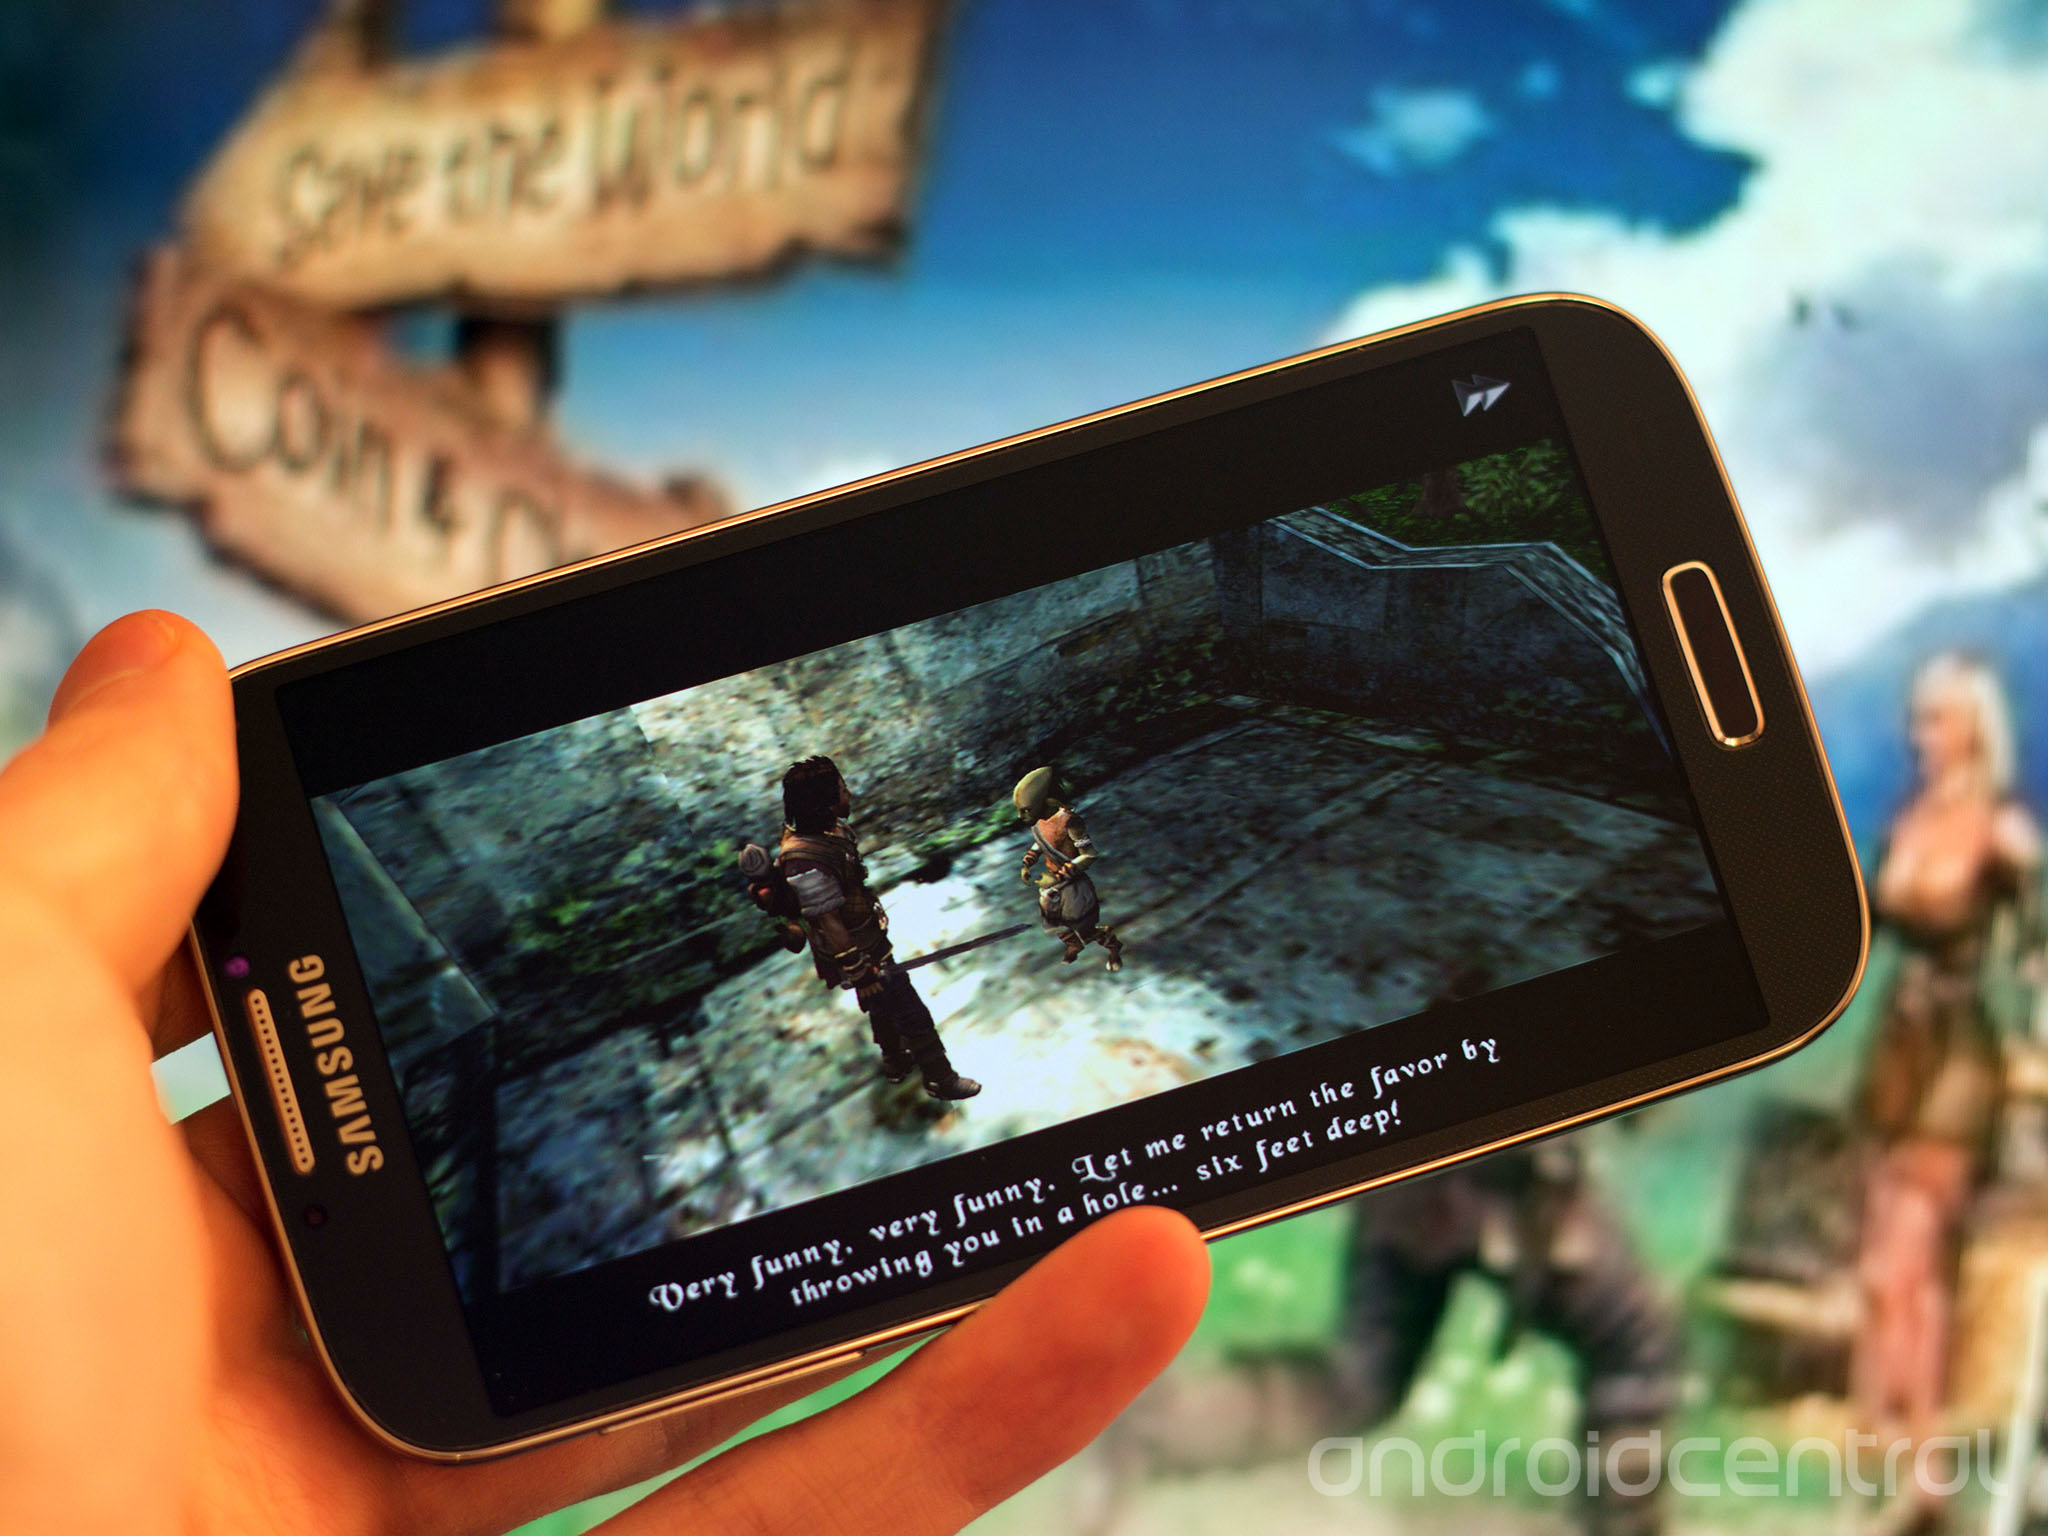 Deretan Game Rpg Terbaik Di Android Aplikasi Hot Topic Forum Polytron W3430 Wizard Crystal 2 The Bards Tale